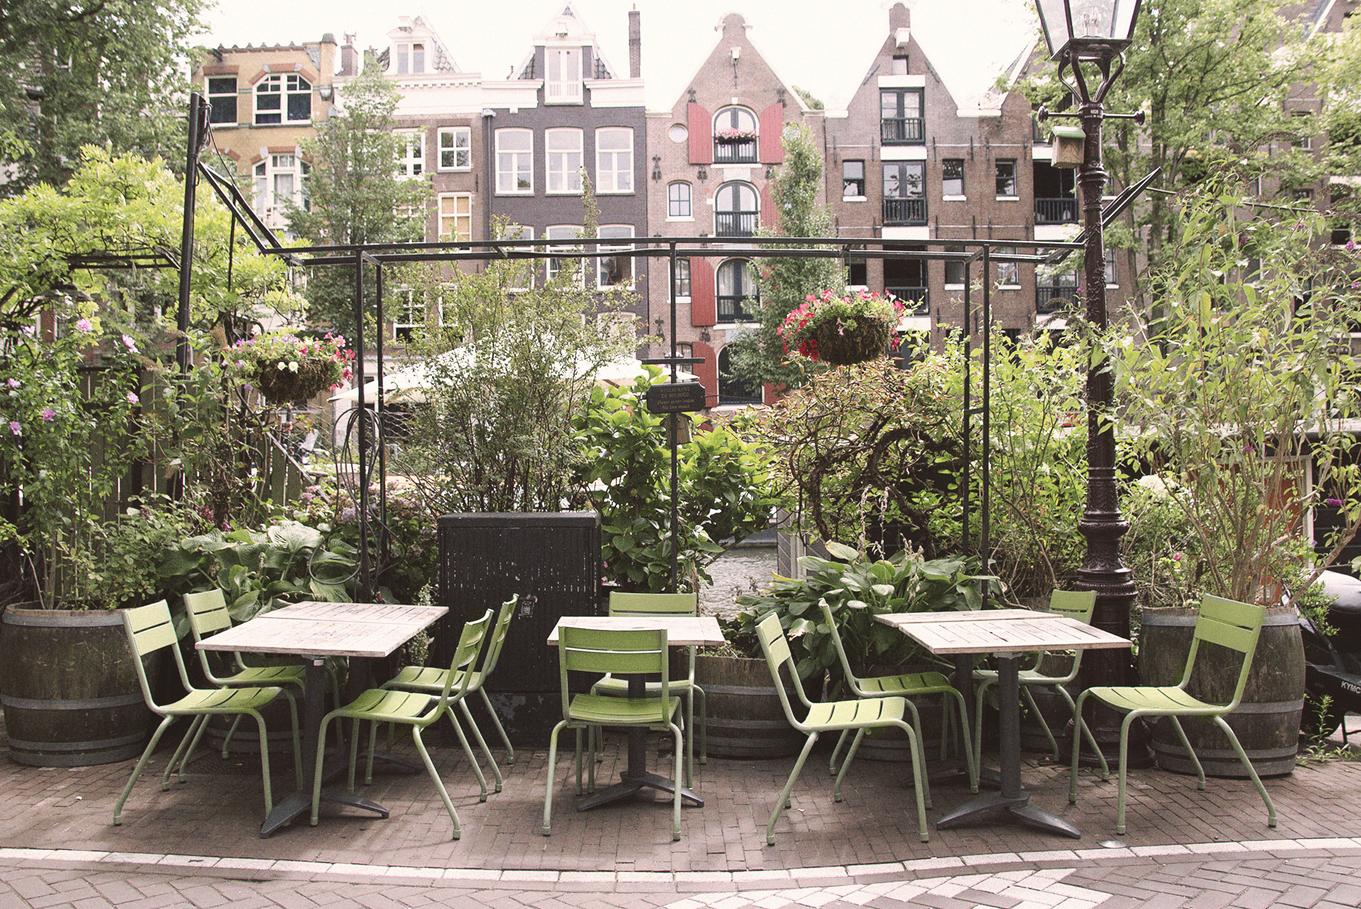 amsterdam_6.jpg